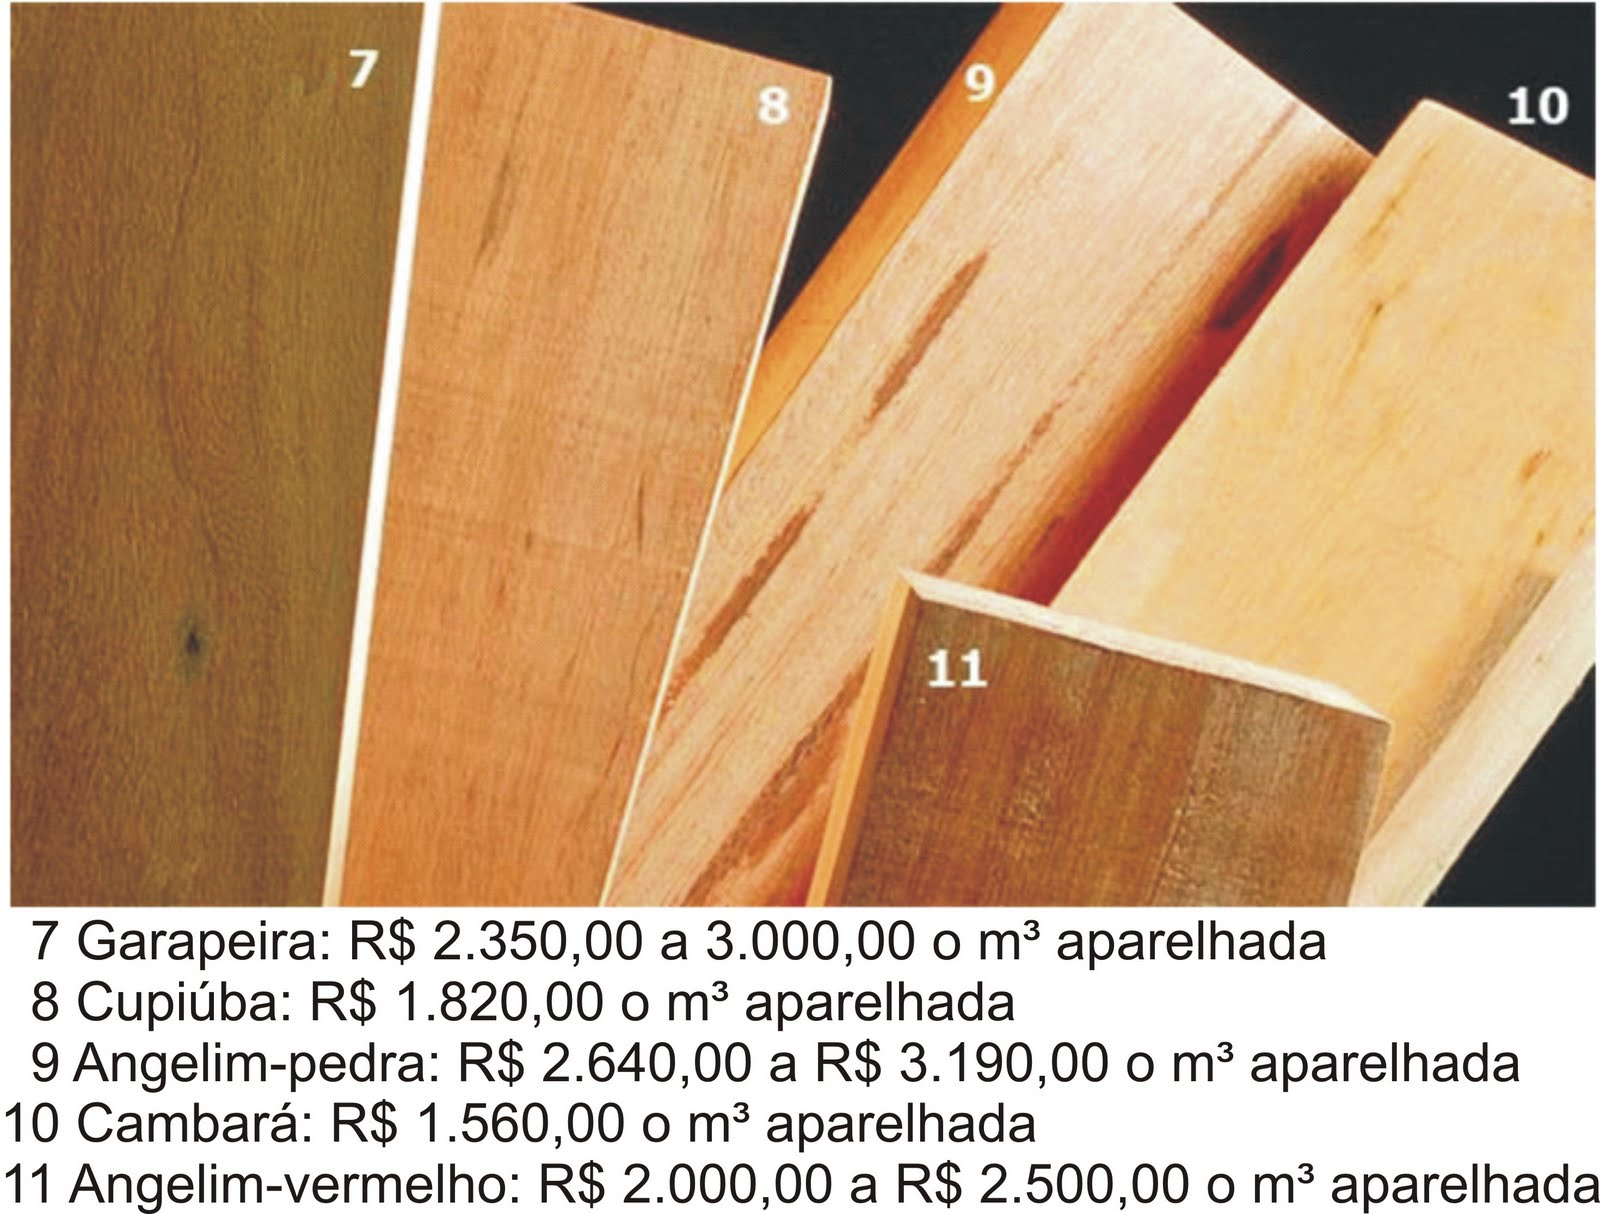 espécies de reflorestamento para equilibrar o consumo de árvores  #B47517 1600x1214